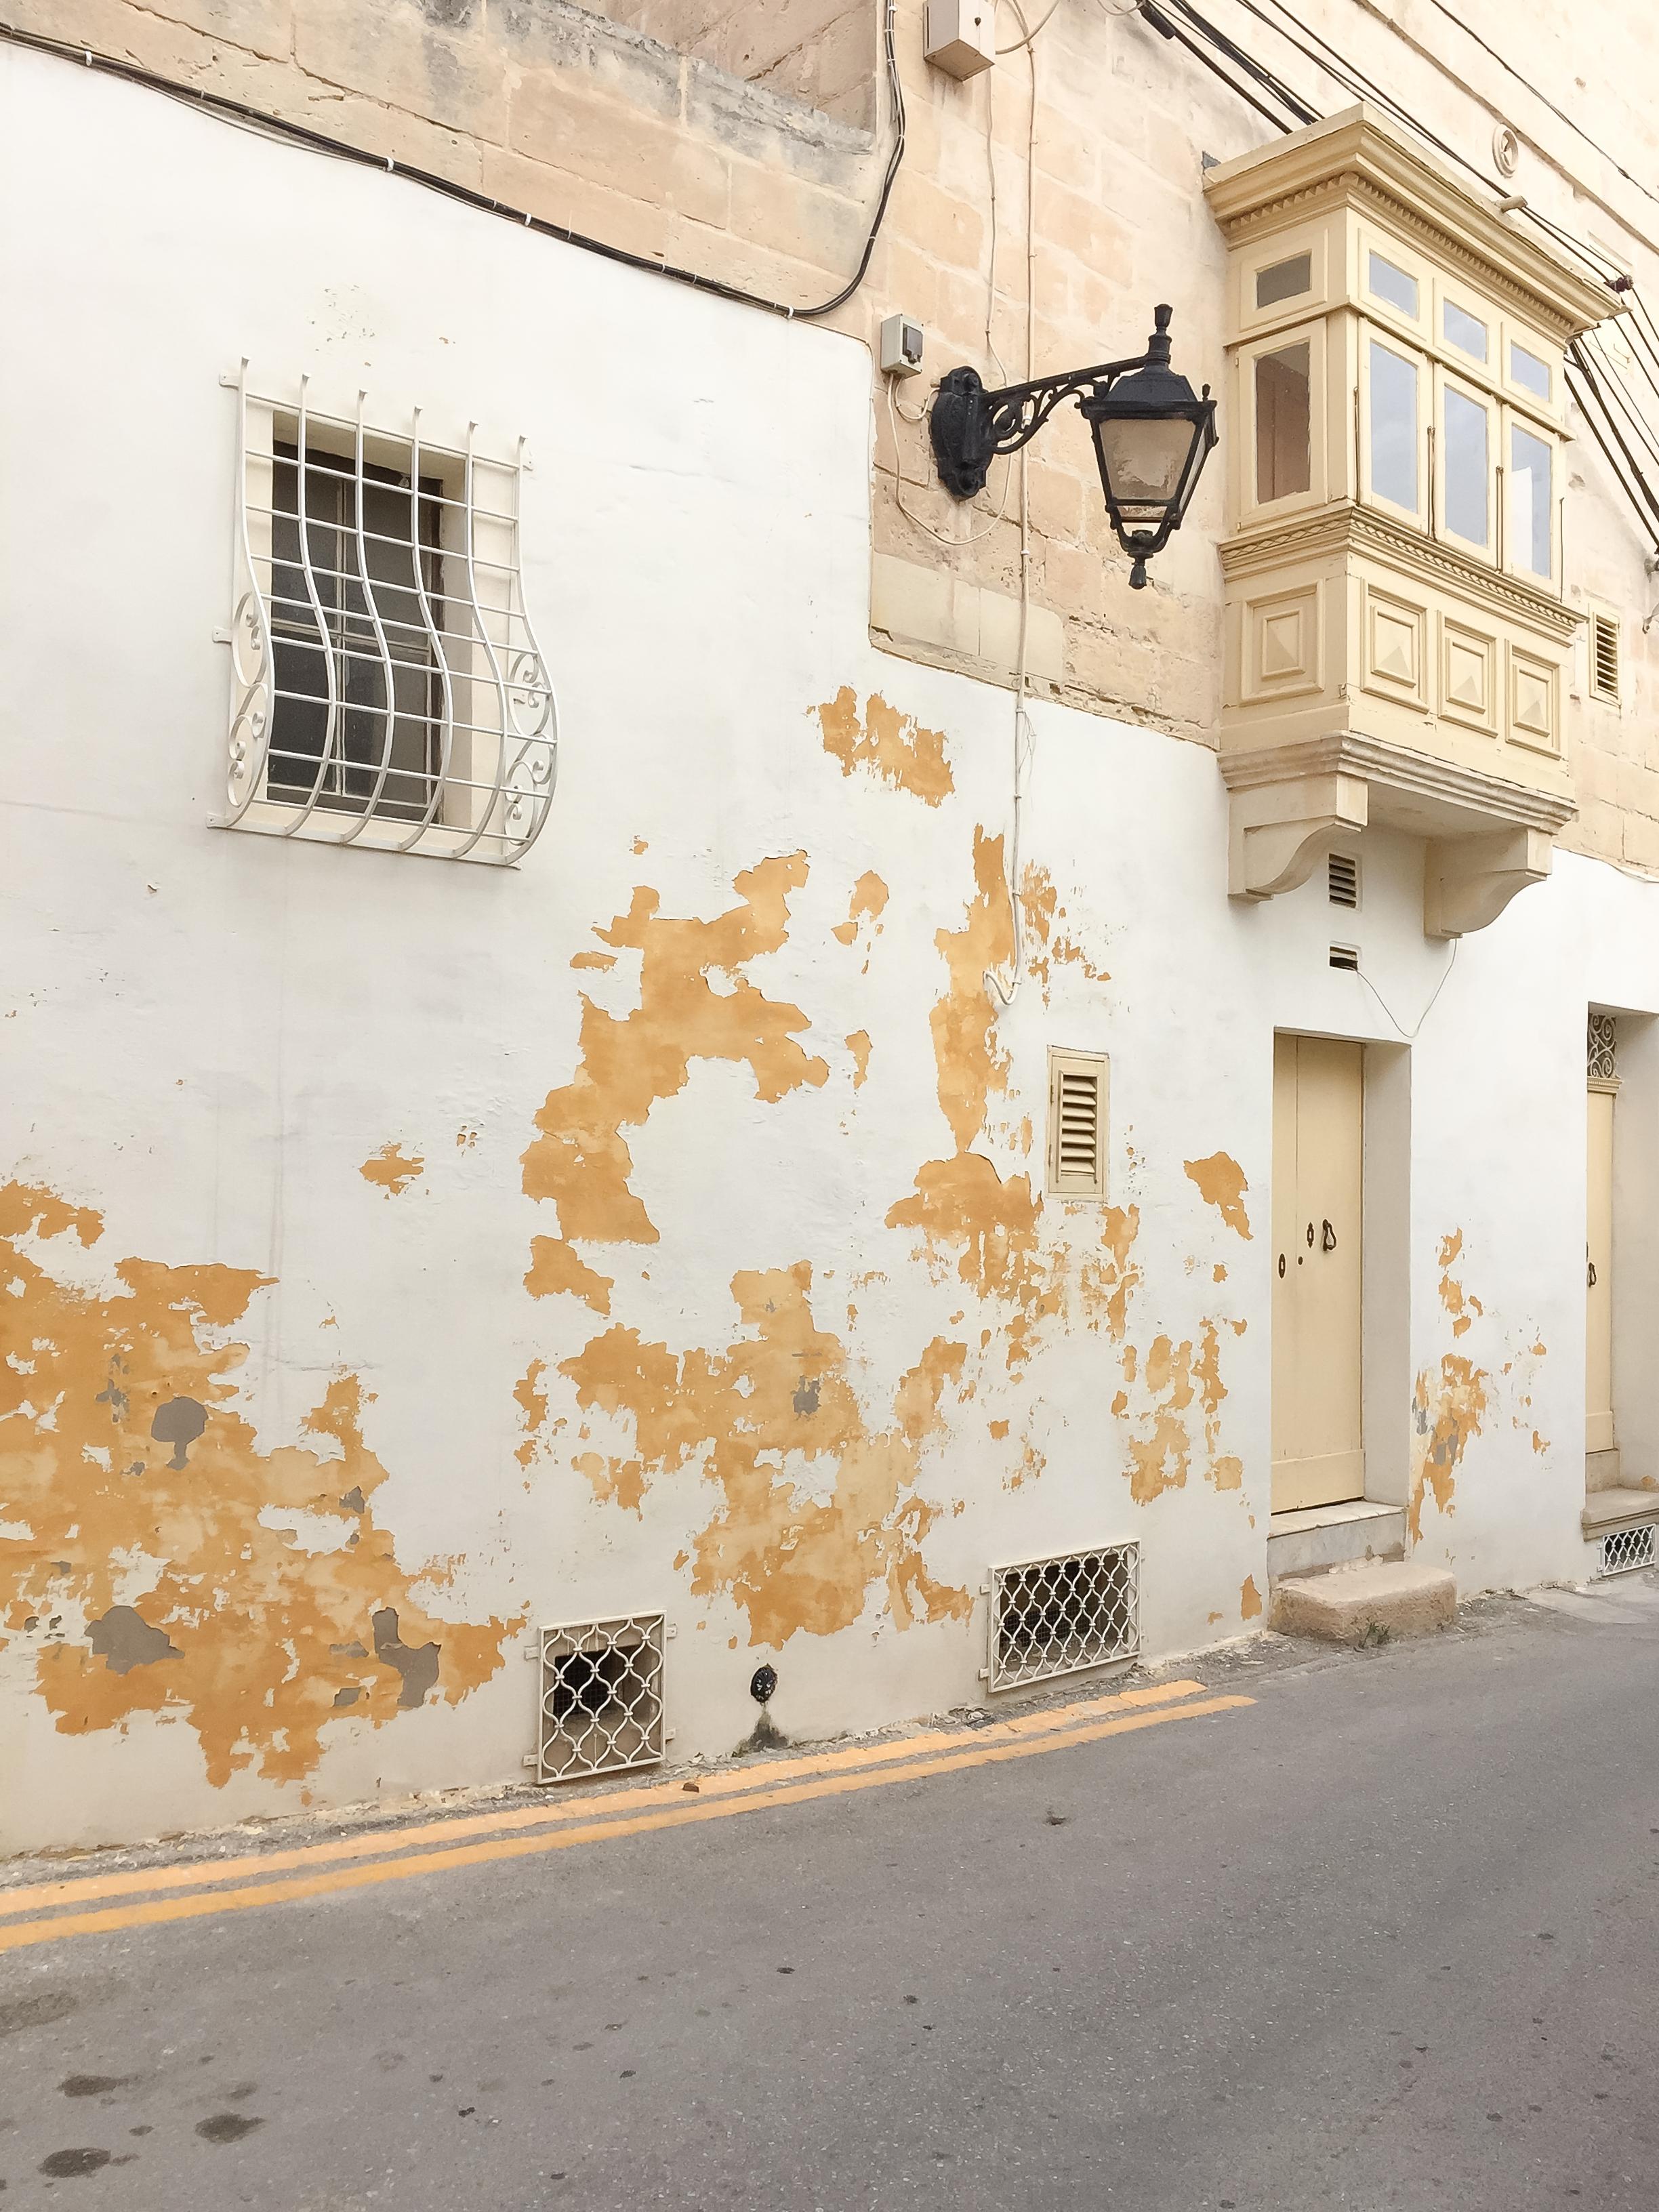 Street of Malta | MĦal Għargħur | - Thinking About Appreciation For Quality In Malta | Malta, Europe | DoLessGetMoreDone.com | - Minimal Travel Documentary Photography - search for Liveability | Sustainability